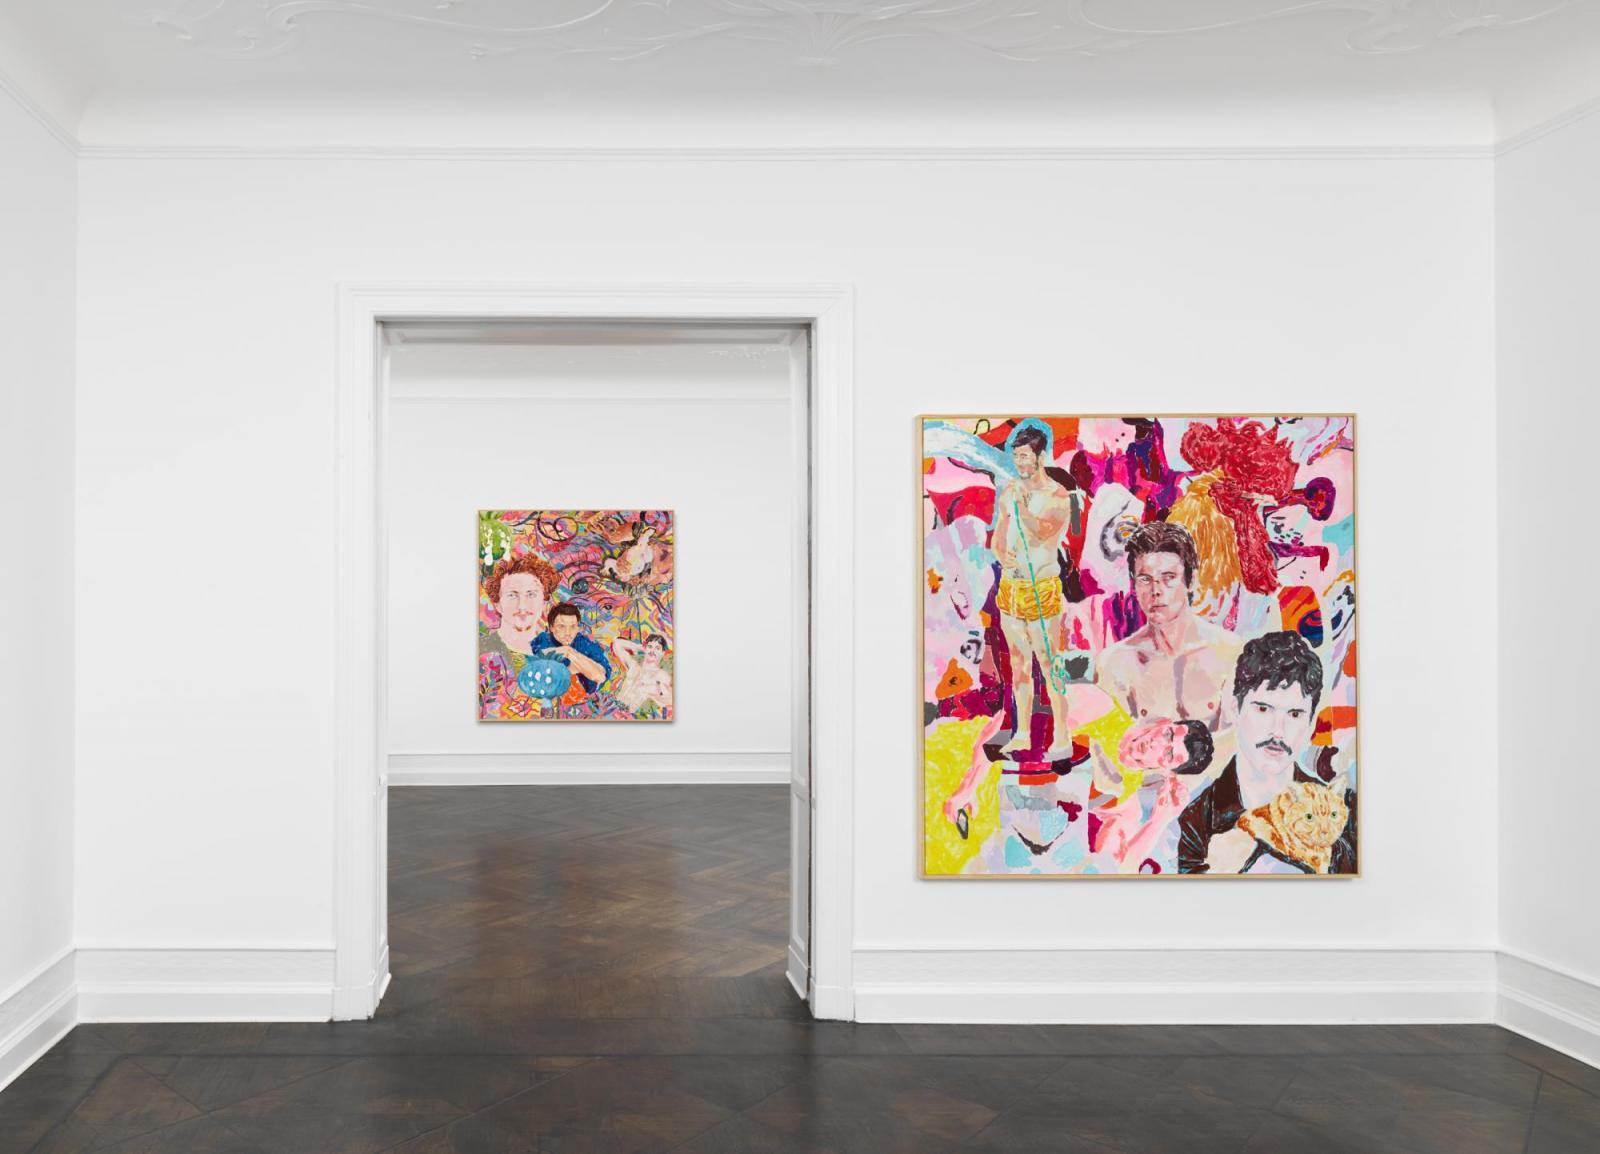 Installation view,Richard Hawkins,Galerie Buchholz, Berlin, 2020